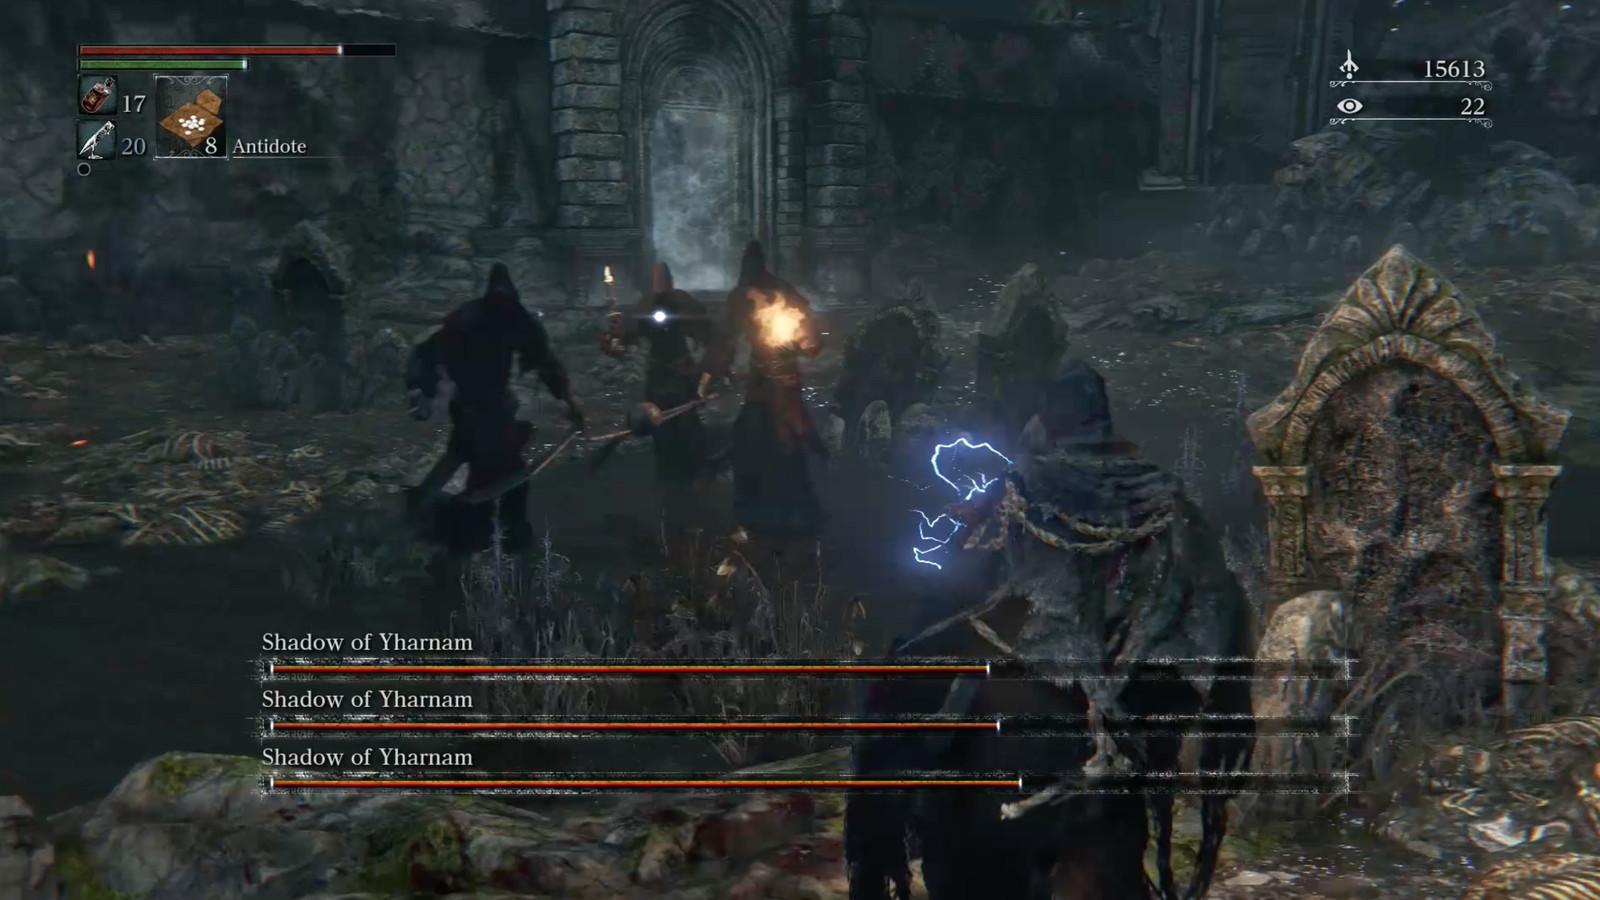 Bloodborne guide: Shadows of Yharnam boss fight - Polygon